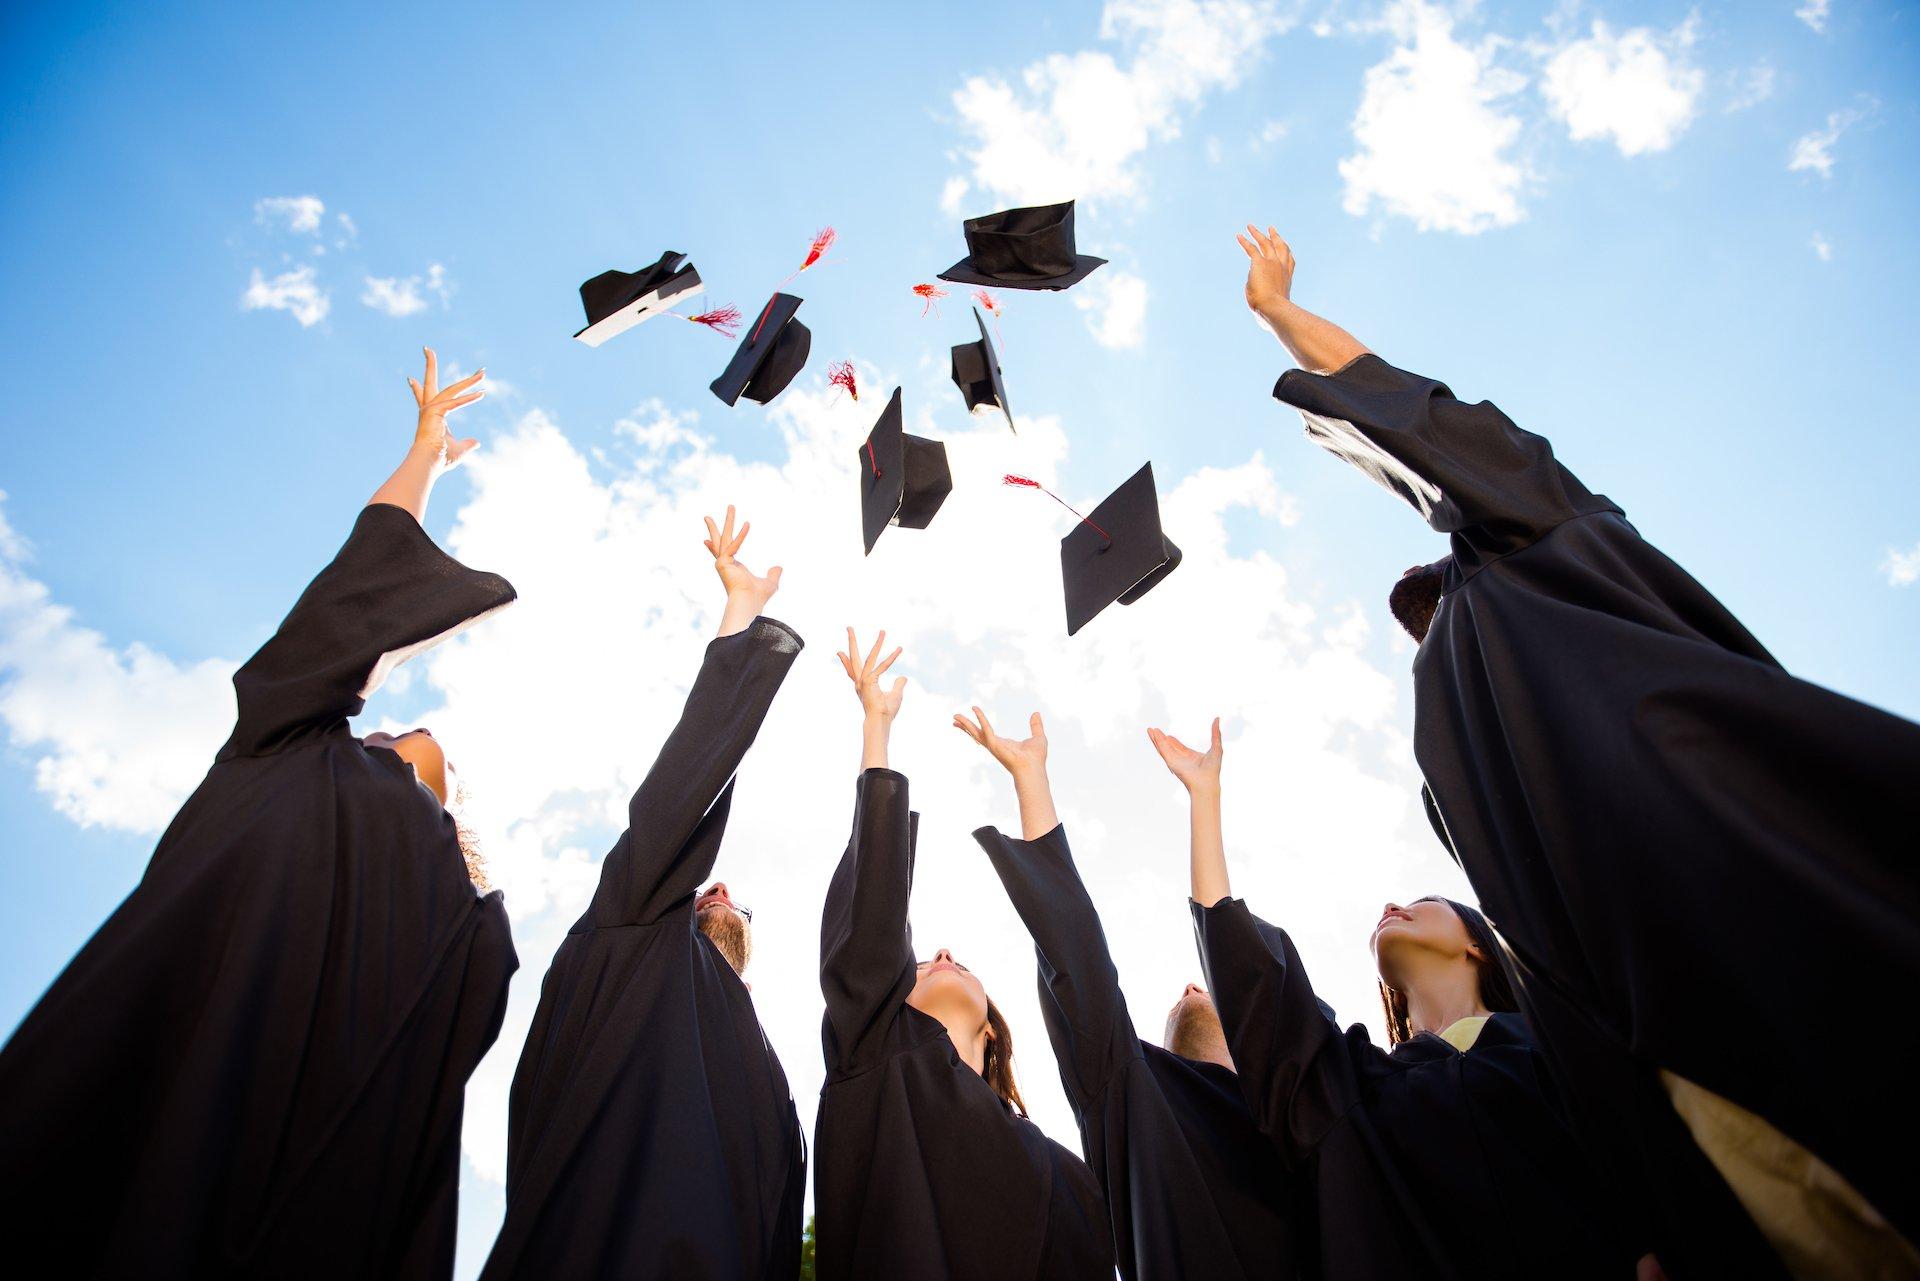 Étudiants célébrant leur diplôme